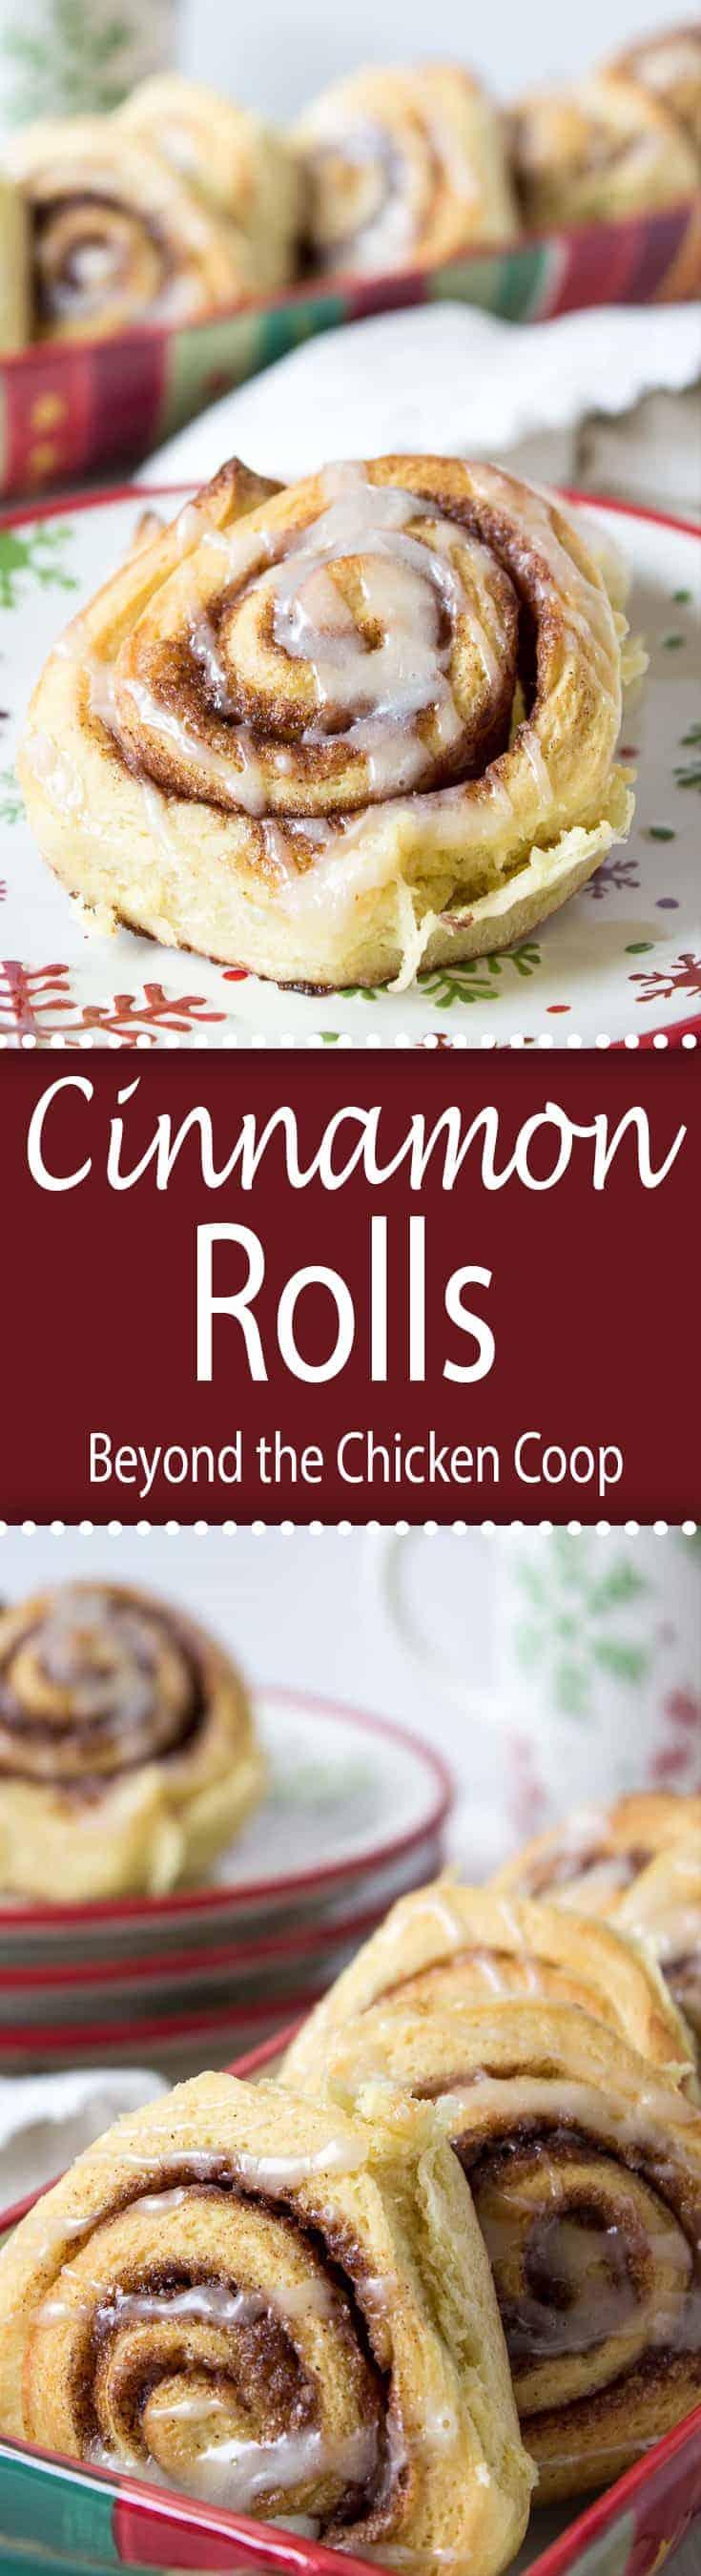 Delicious homemade cinnamon rolls. #cinnamonrolls #baking #cinnamon